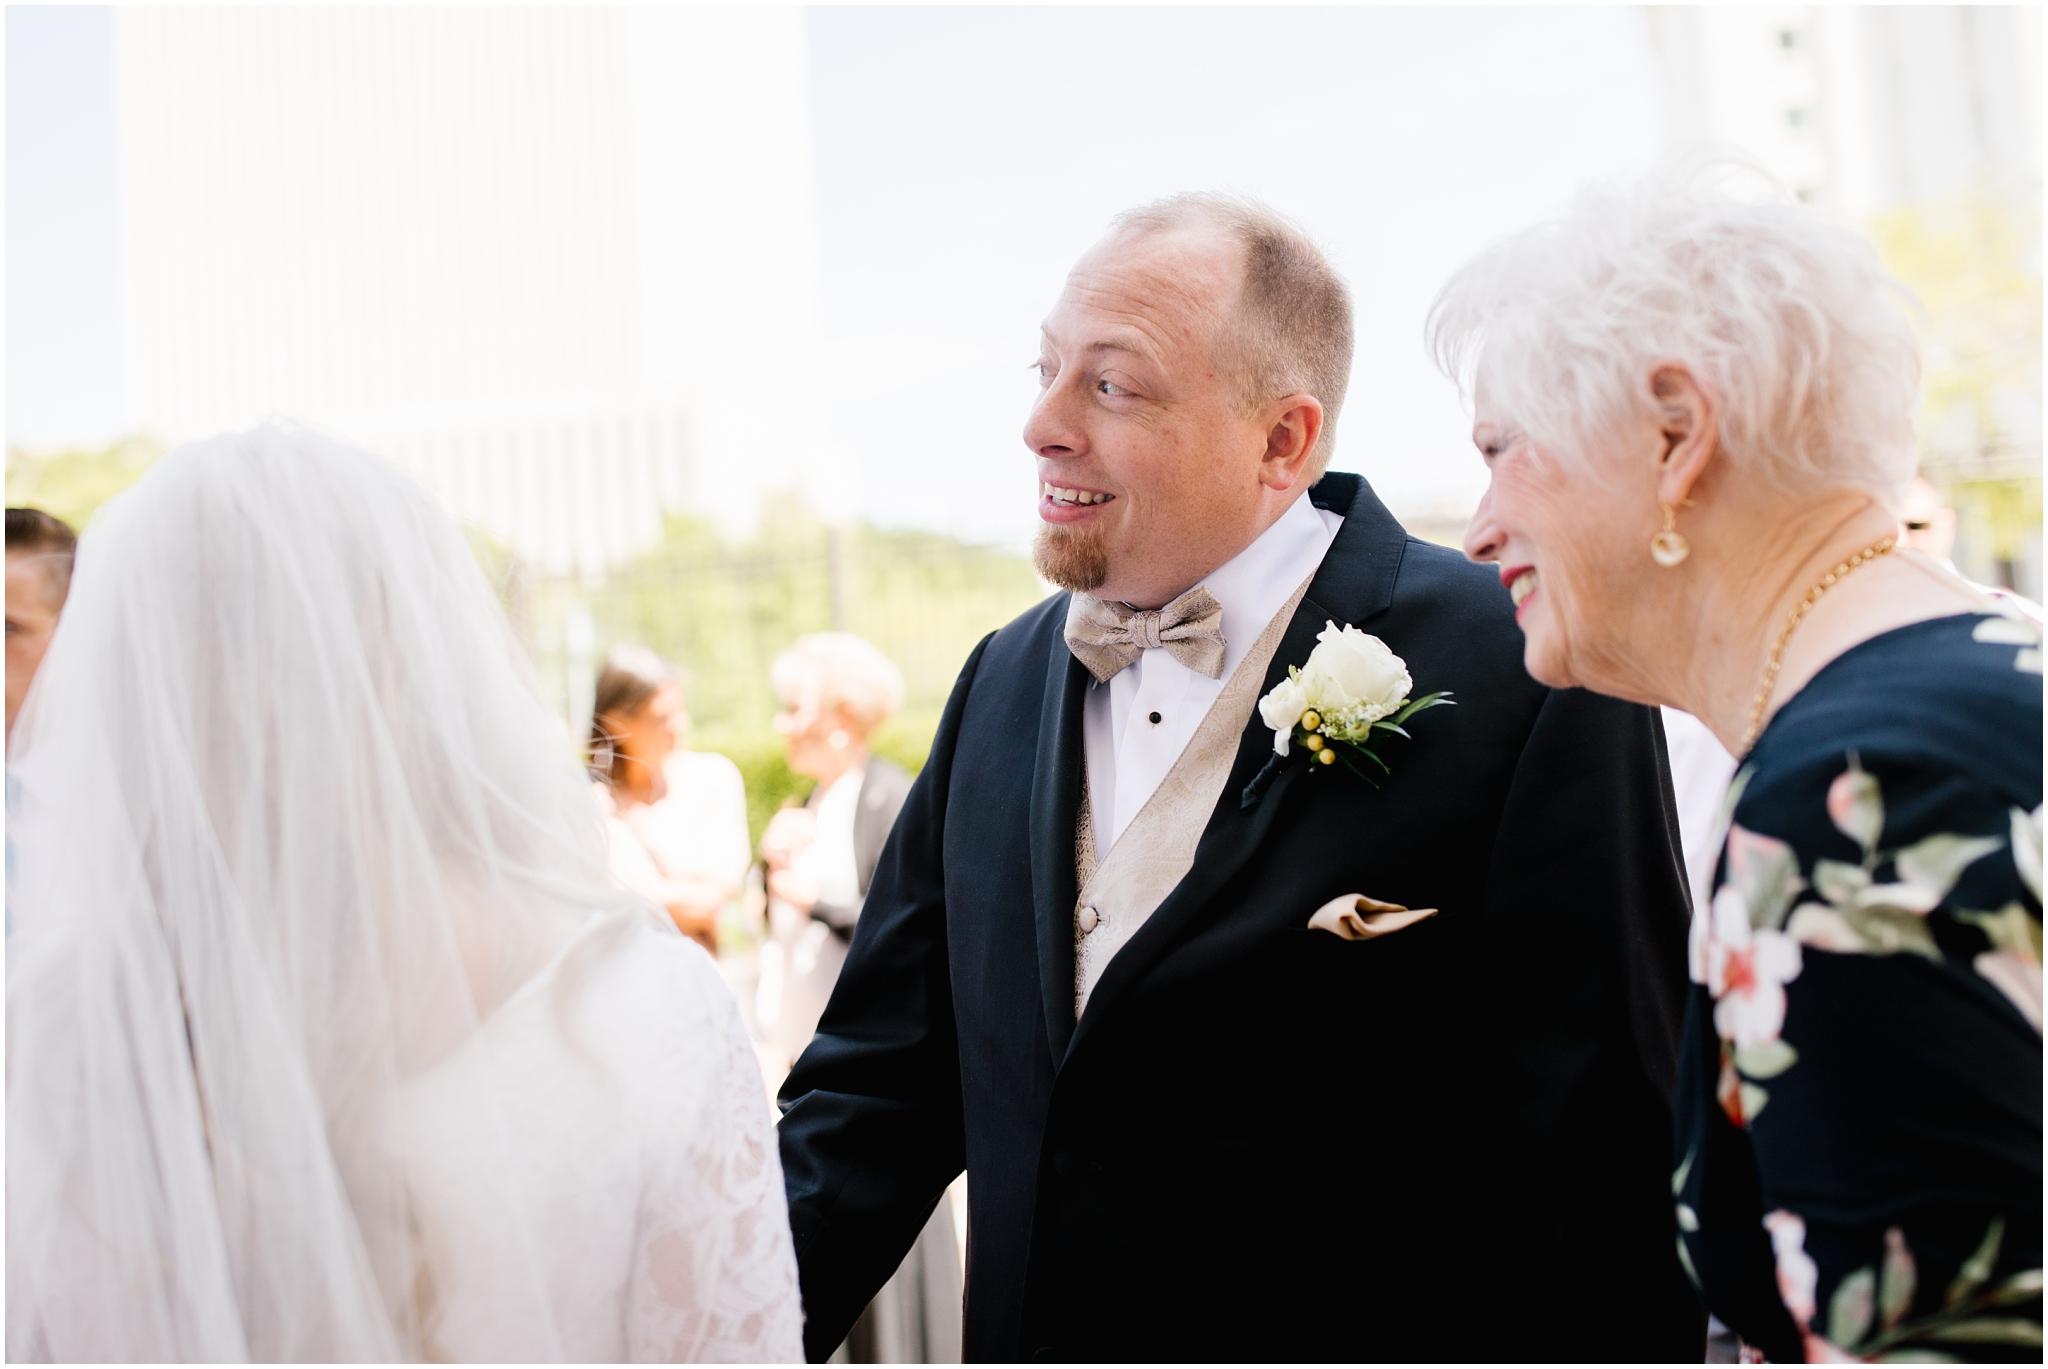 CherylandTyler-34_Lizzie-B-Imagery-Utah-Wedding-Photographer-Salt-Lake-City-Temple-Wells-Fargo-Building-Reception.jpg